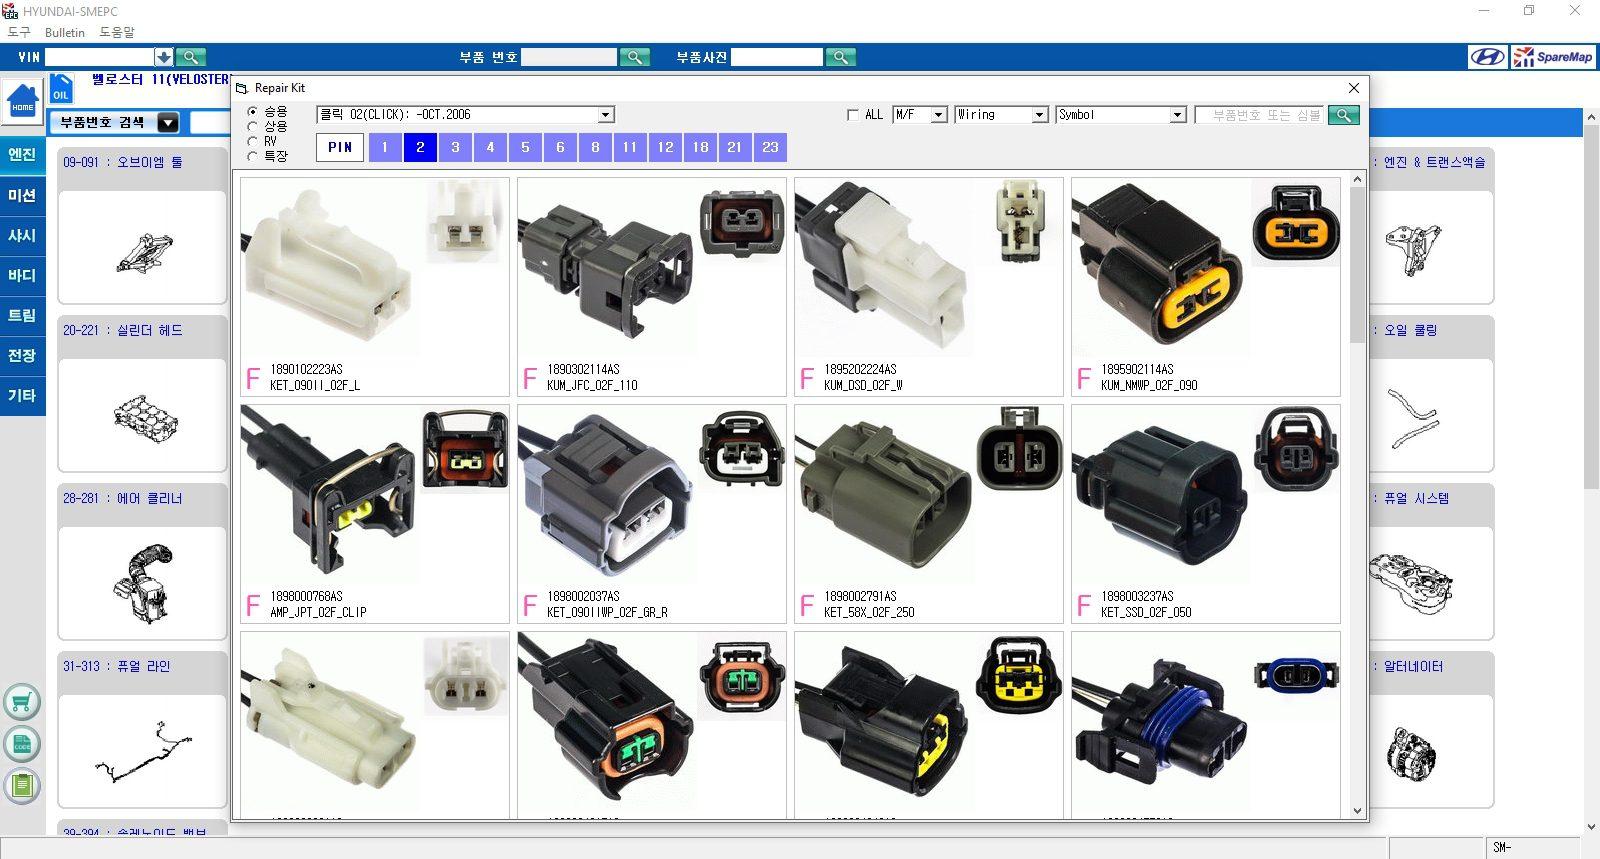 Hyundai_Kia_Korea_SM_EPC_072019_Parts_Catalog_Domestic_Market_13